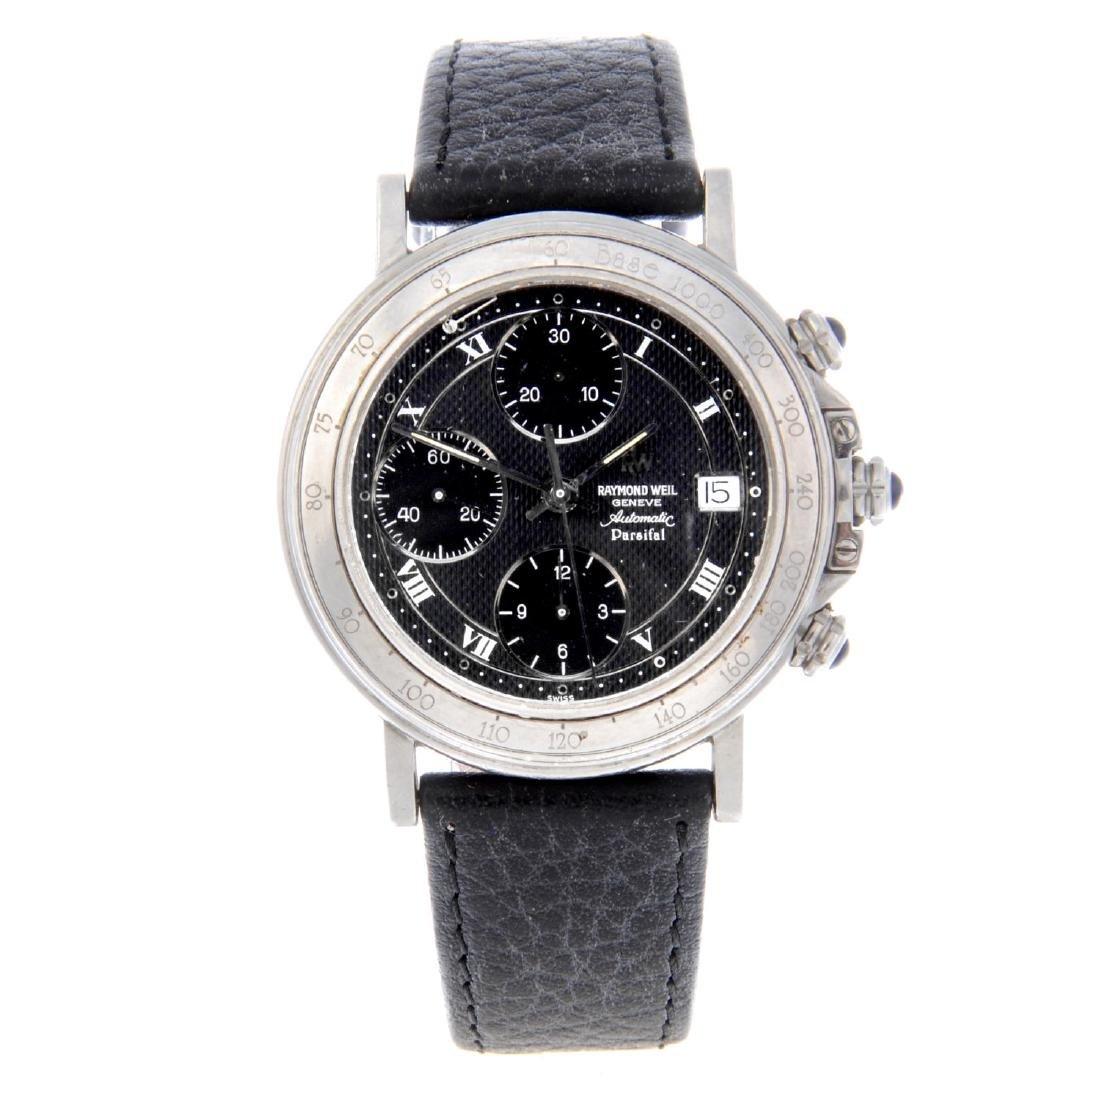 RAYMOND WEIL - a gentleman's Parsifal chronograph wrist